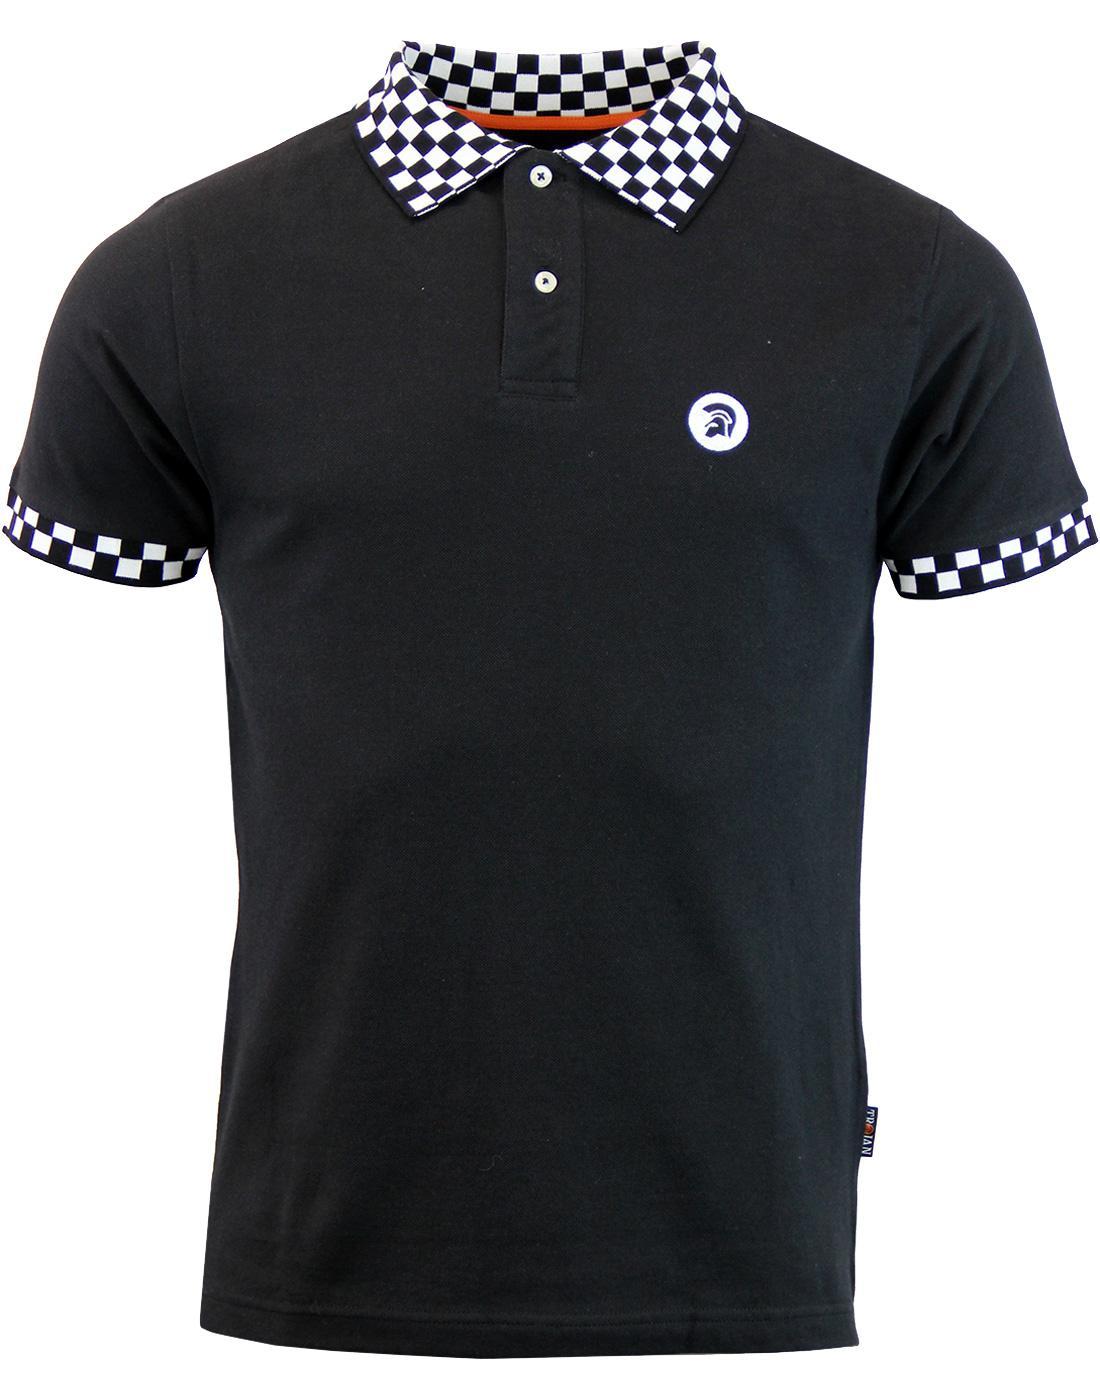 TROJAN RECORDS Ska Mod Revival Checkerboard Polo B